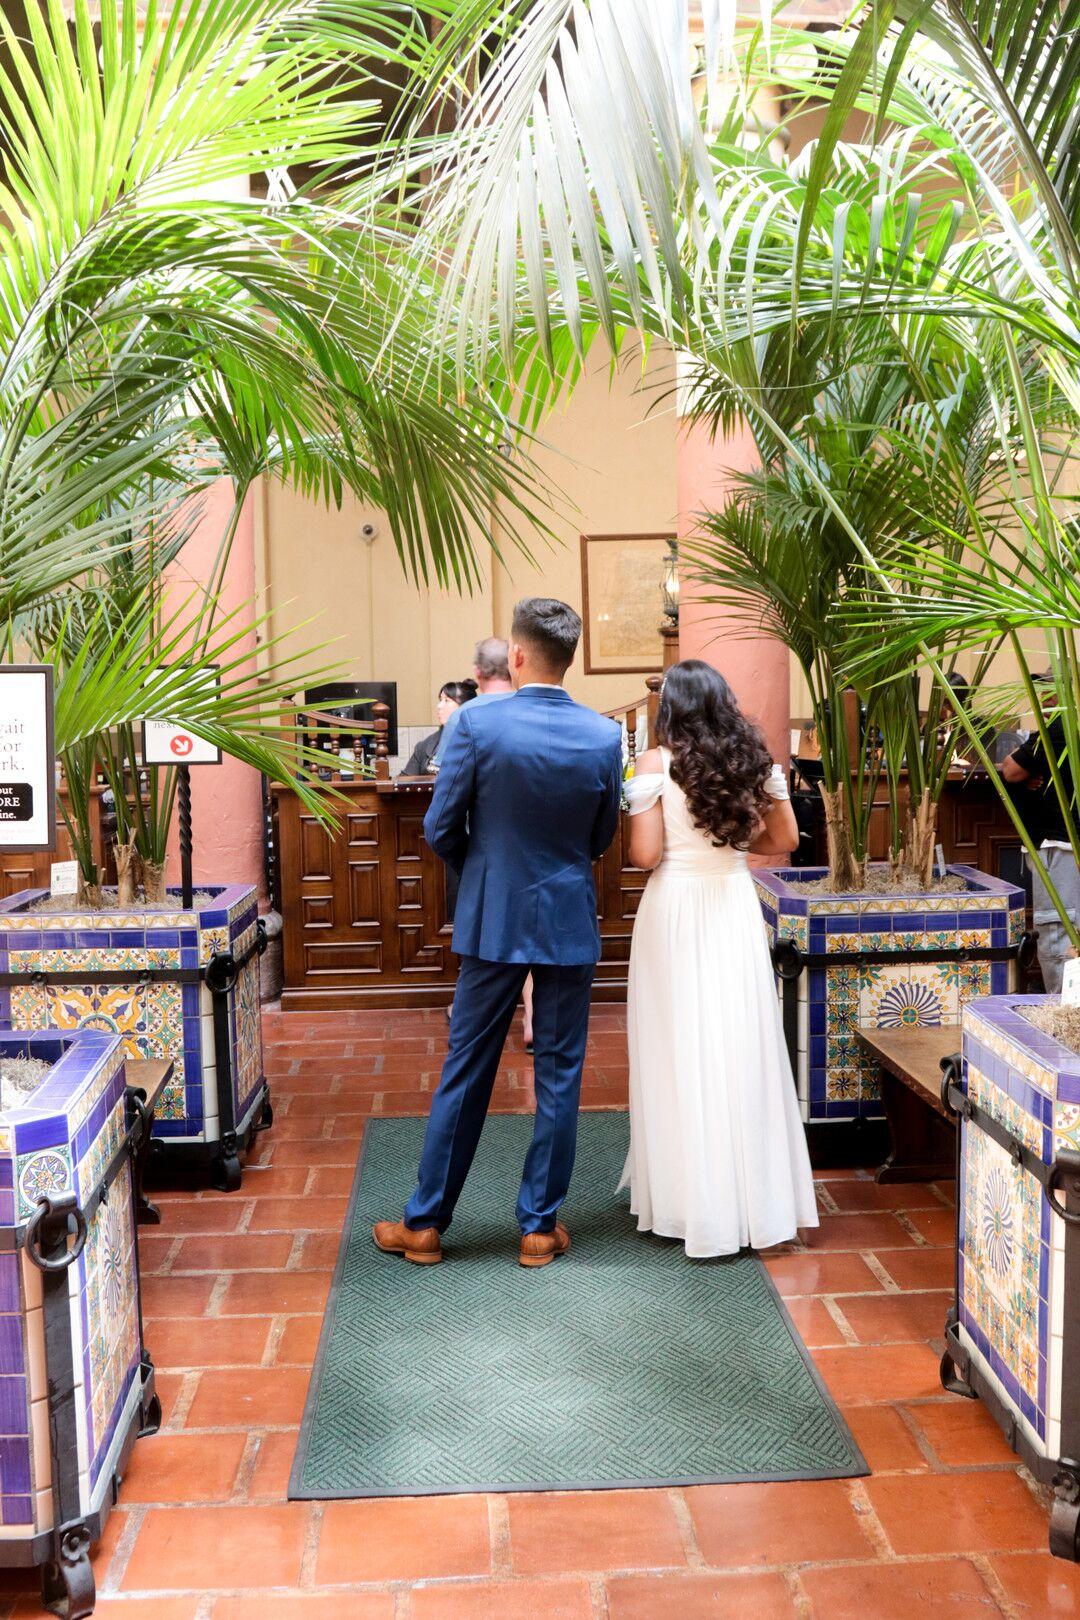 www.santabarbaraweddings.com | Photographer: Trista Maja Photography | Venue: Santa Barbara Courthouse | Wedding Dress: Lulus | Hair: Legends Hair |  Couple Pre-Ceremony